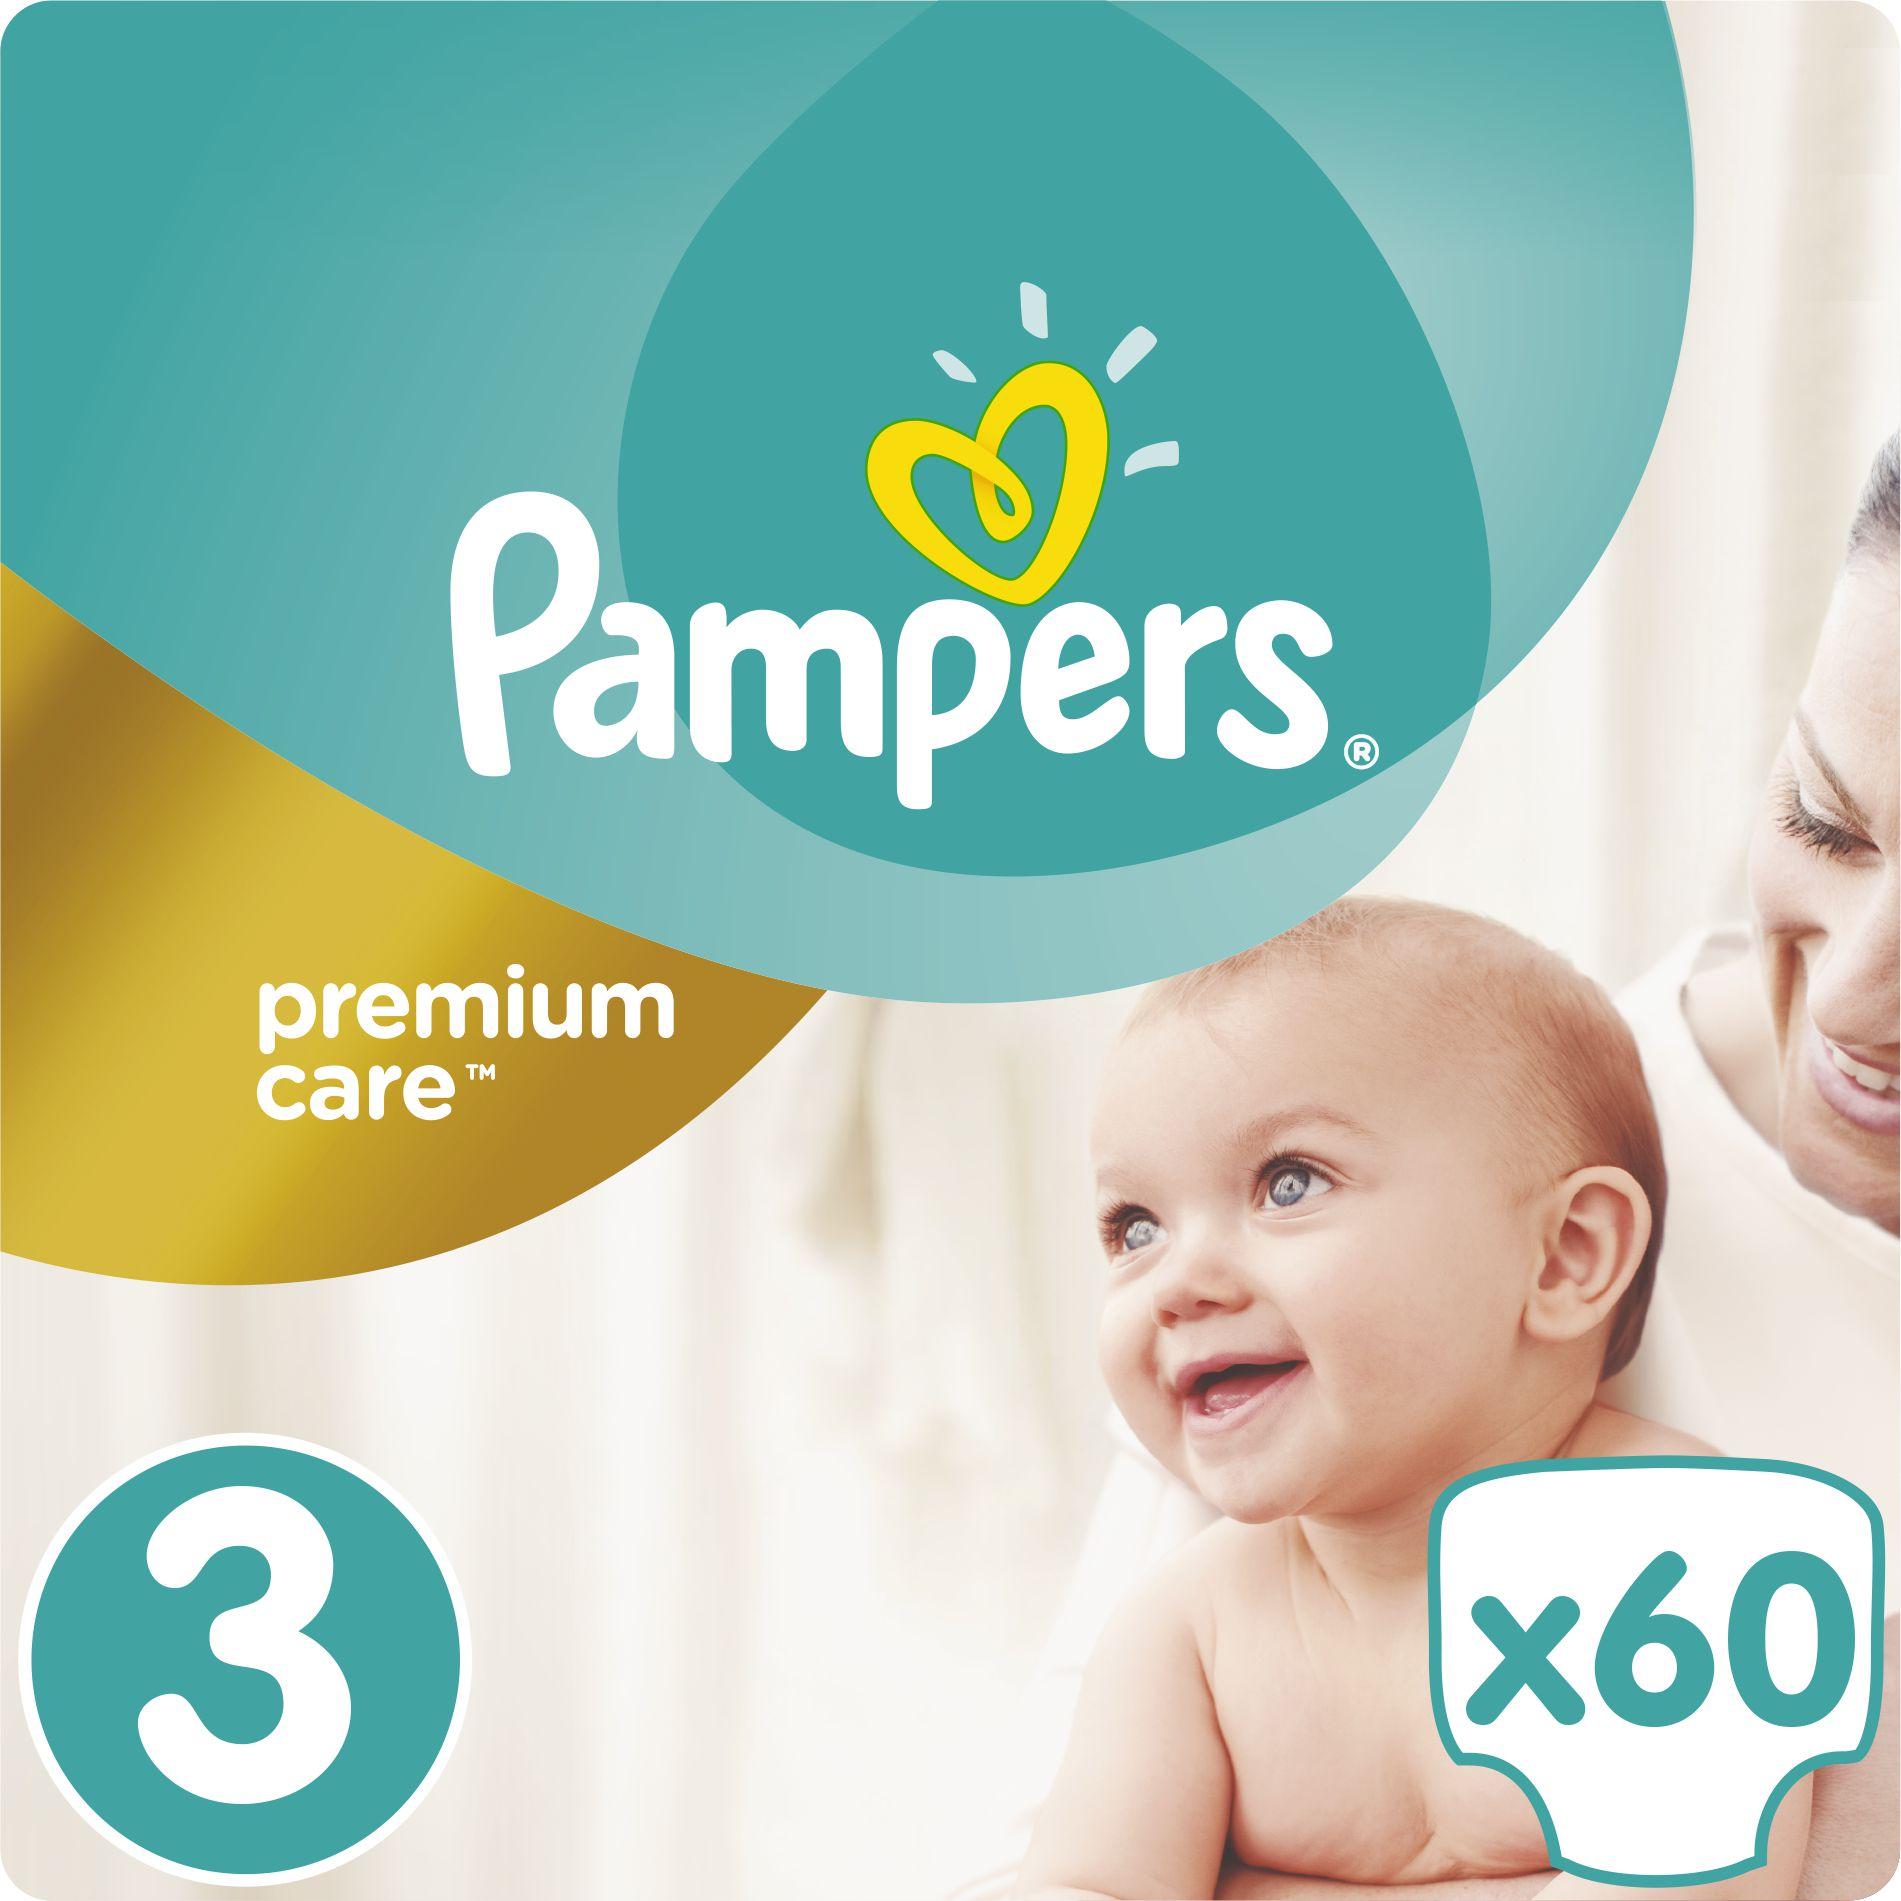 Pampers Premium Care 3 60 pc(s)